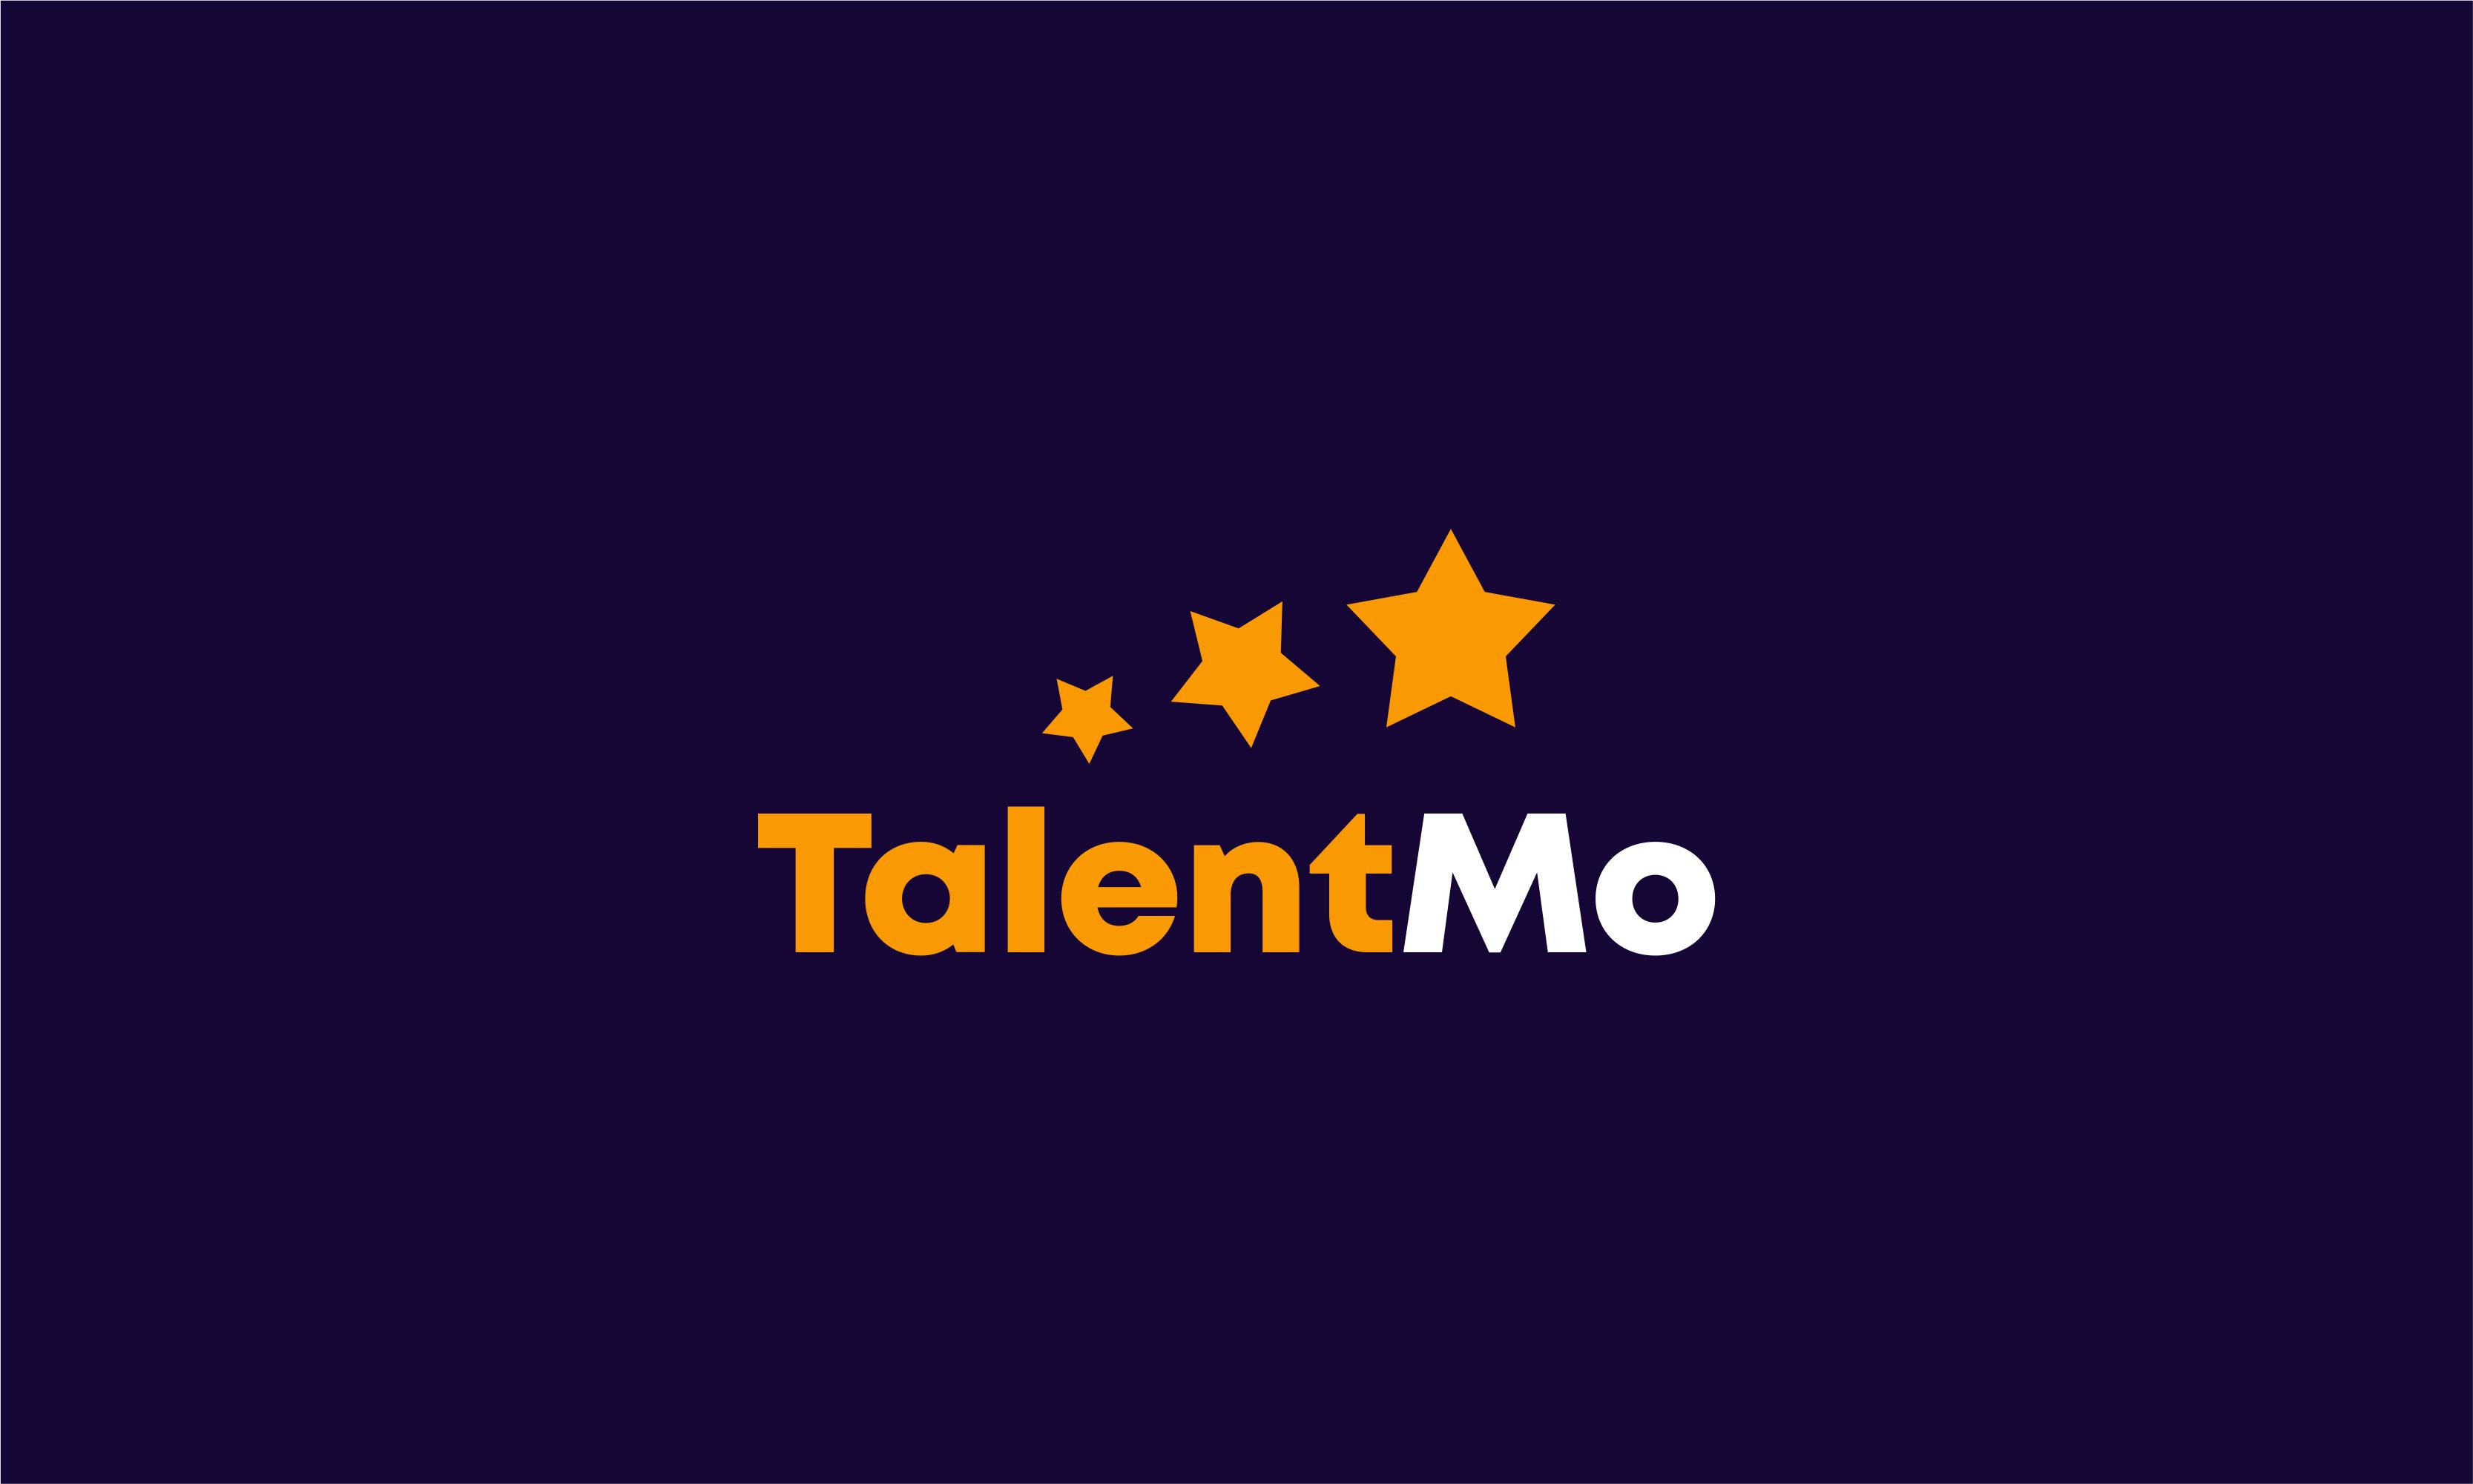 Talentmo